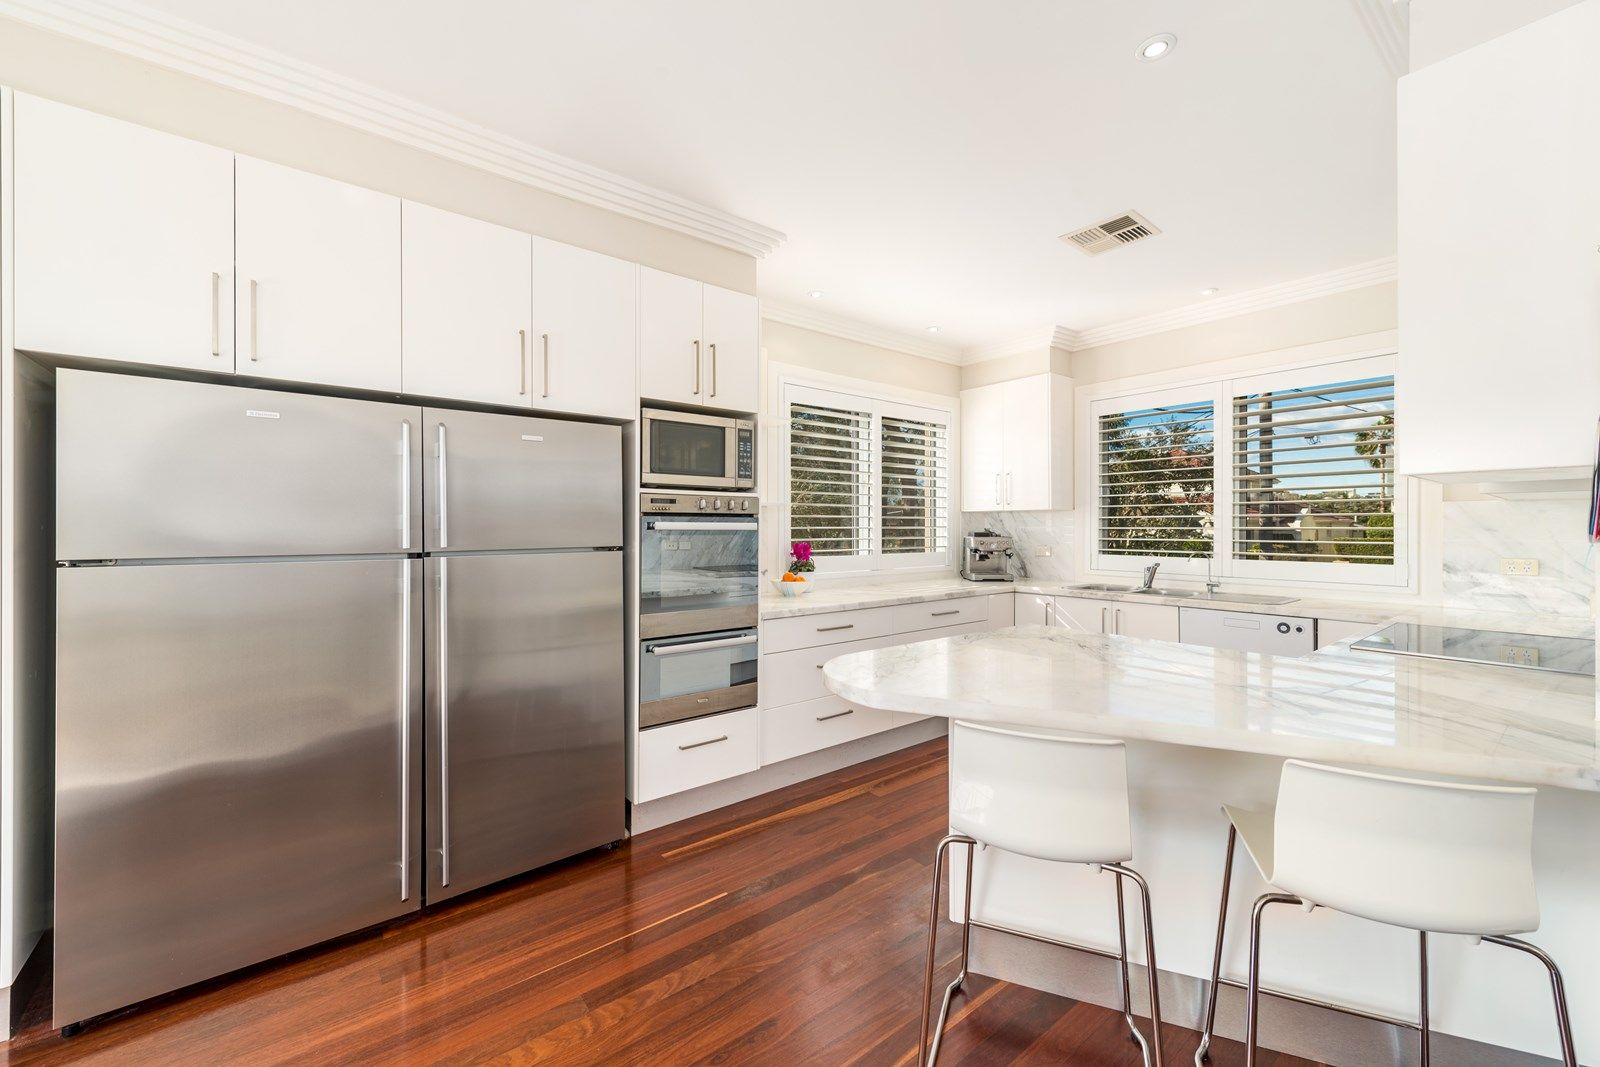 8486 Spit Road, MOSMAN NSW 2088 House, Home decor, Kitchen